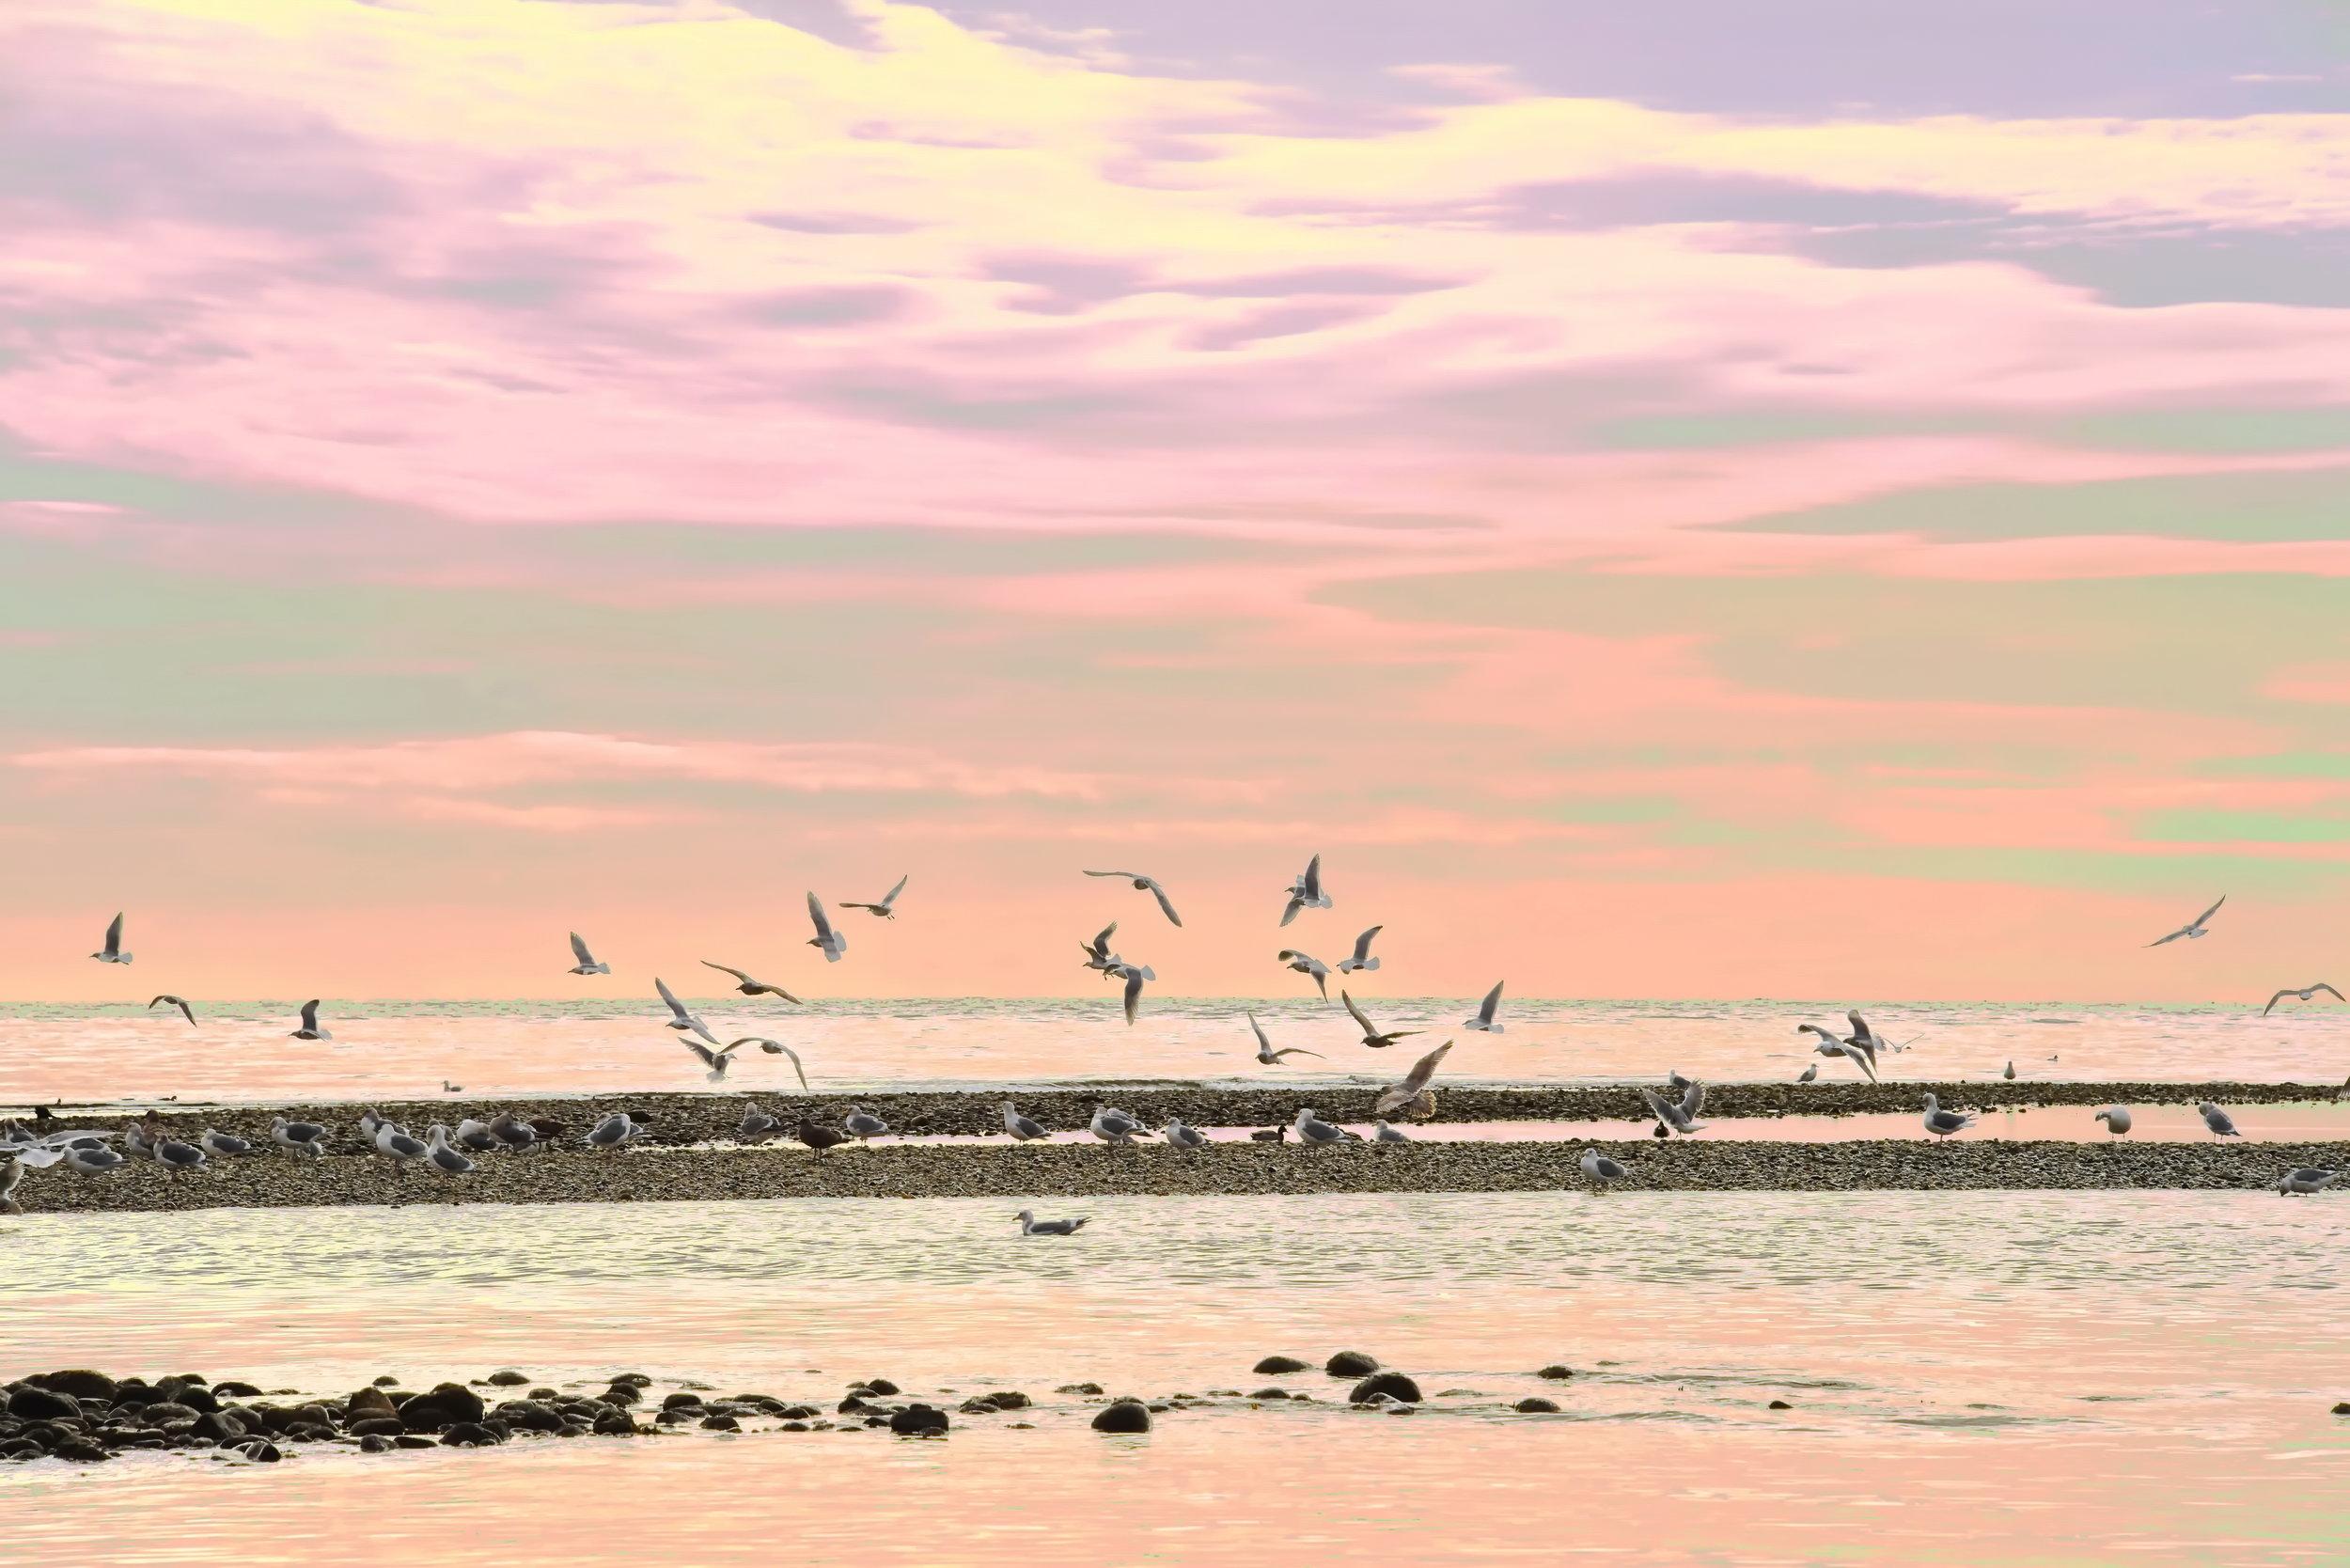 Morning Sky Sunshine Coast, B.C.    16 x 24 Canvas 225.00 16 x 24 HD Metal 300.00 12 x 18 HD Metal 200.00    16 x 24 Brushed Aluminum 225.00 12 x 18 Brushed Aluminum 150.00